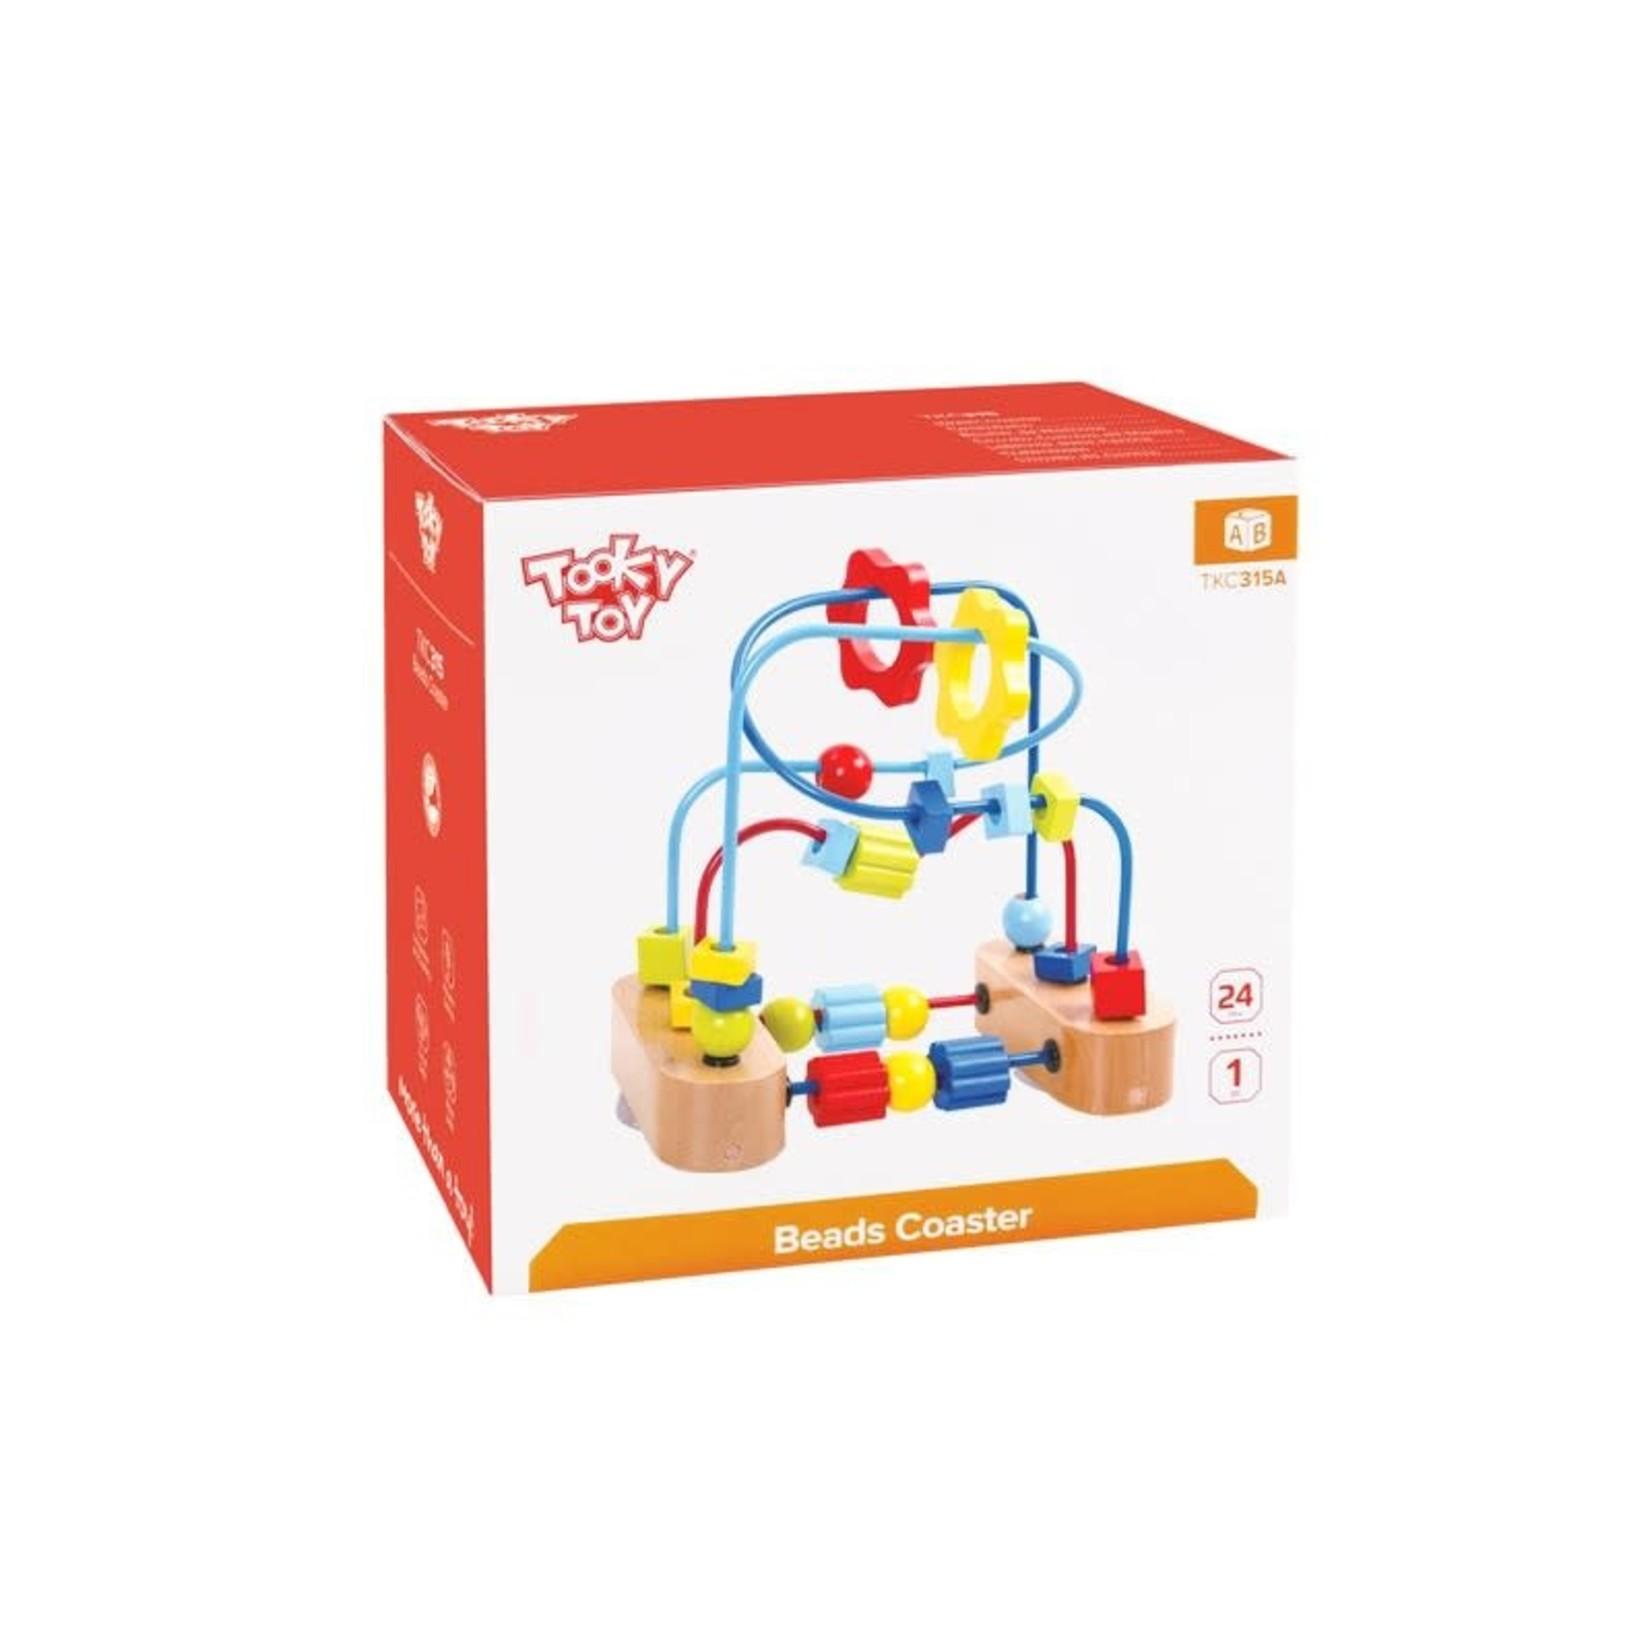 Tooky Toy Beads Coaster